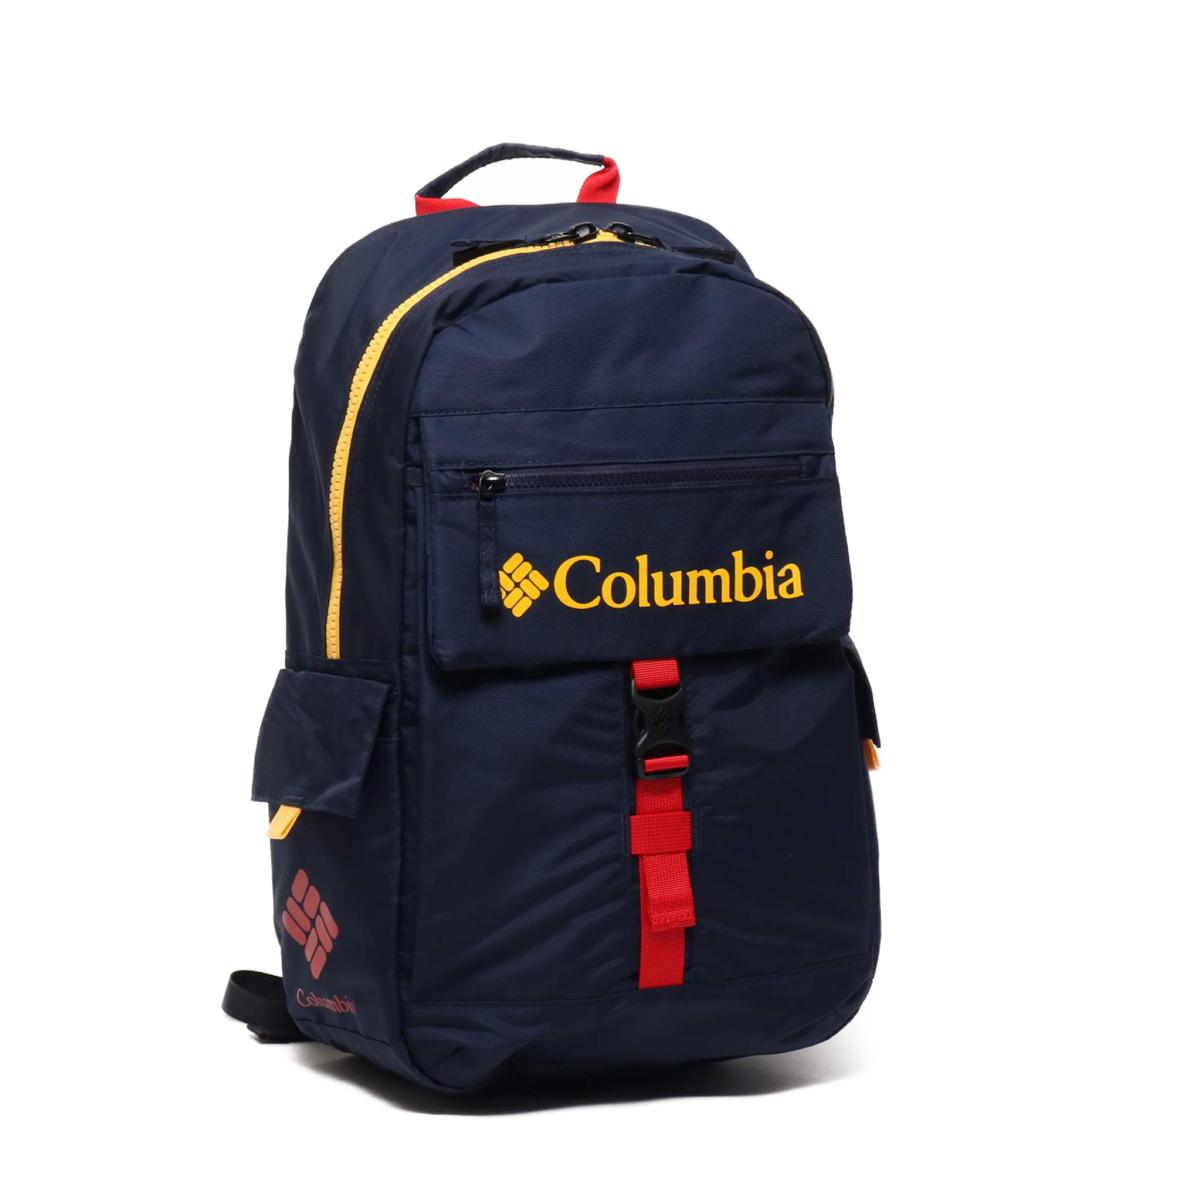 Columbia Popo Dash(TM) Backpack(コロンビア ポポダッシュ バックパック)Columbia Navy Multi【メンズ レディース バックパック】19FA-I